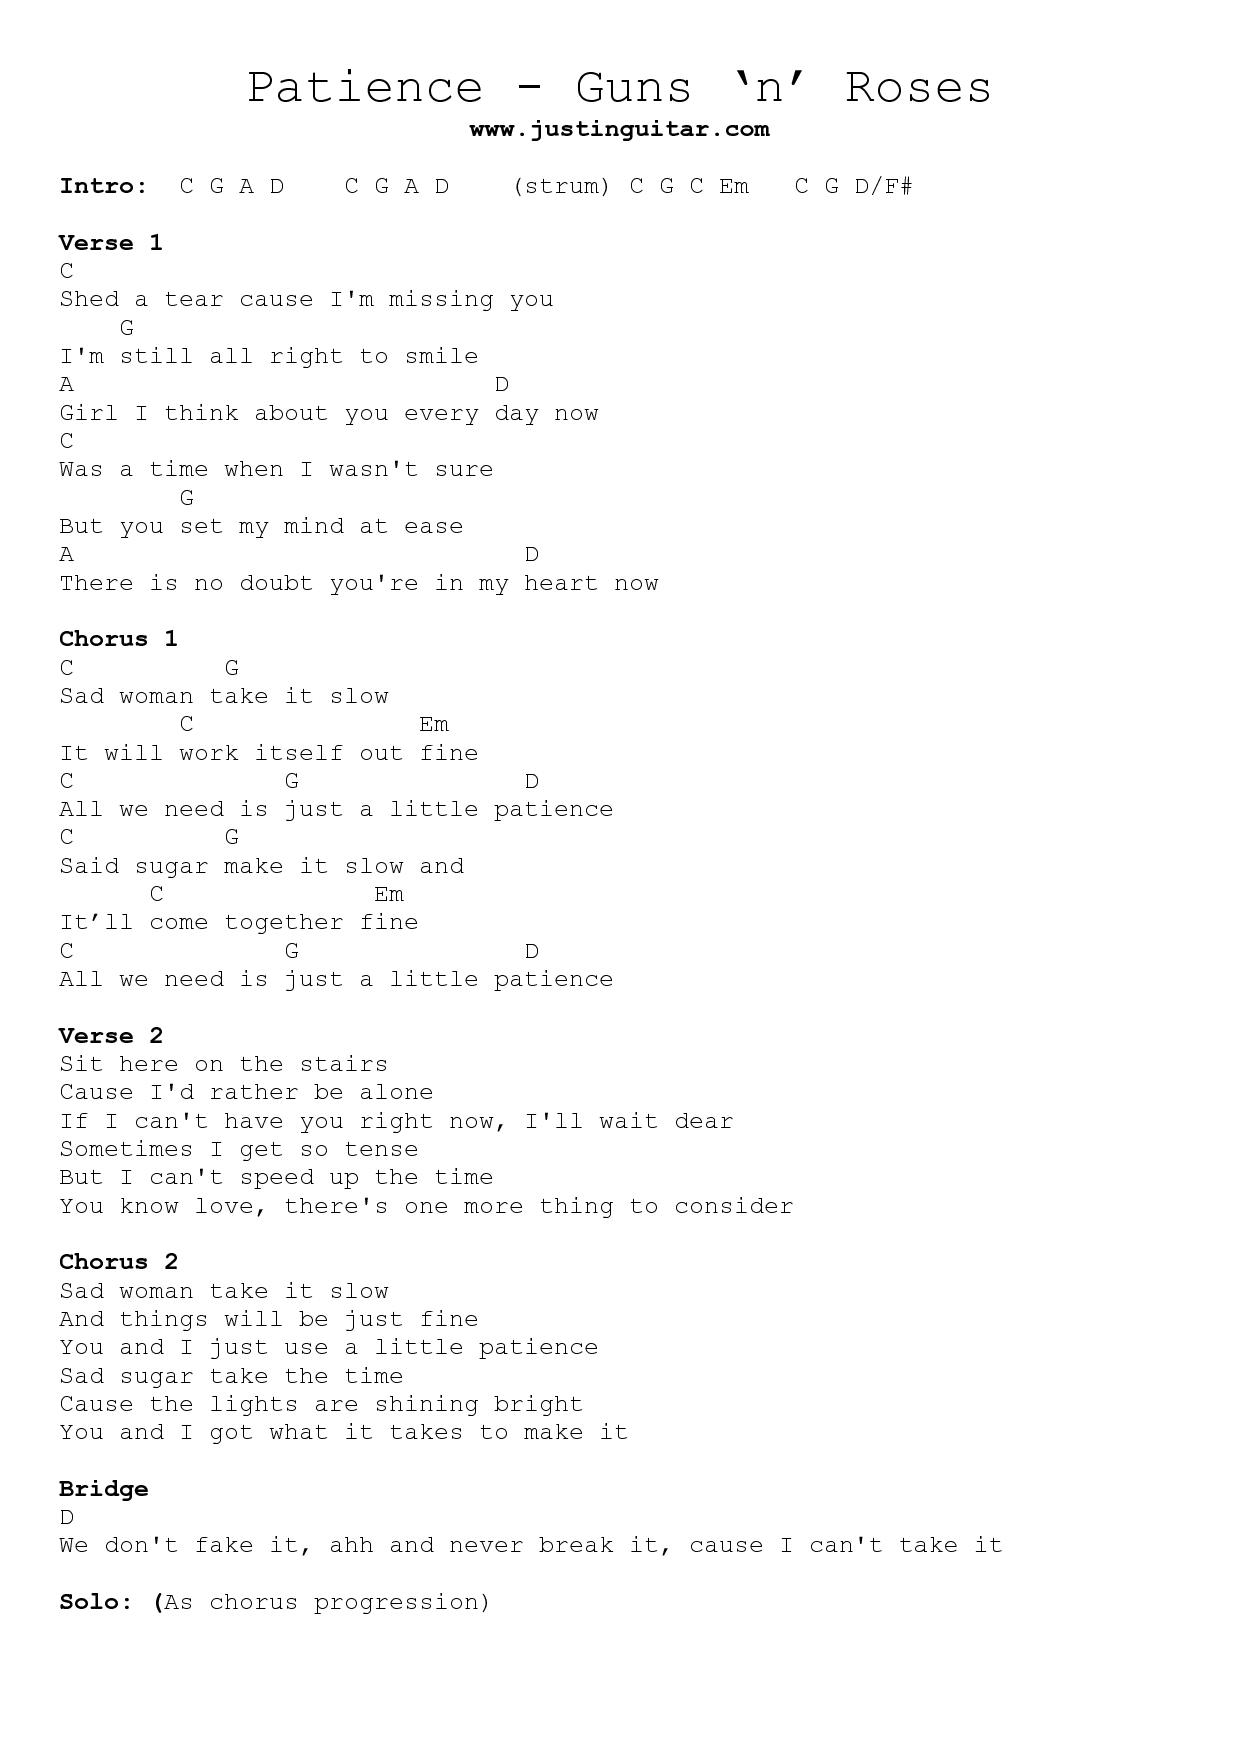 Patience guns n roses lyrics google sk people pinterest patience guns n roses lyrics google sk hexwebz Choice Image